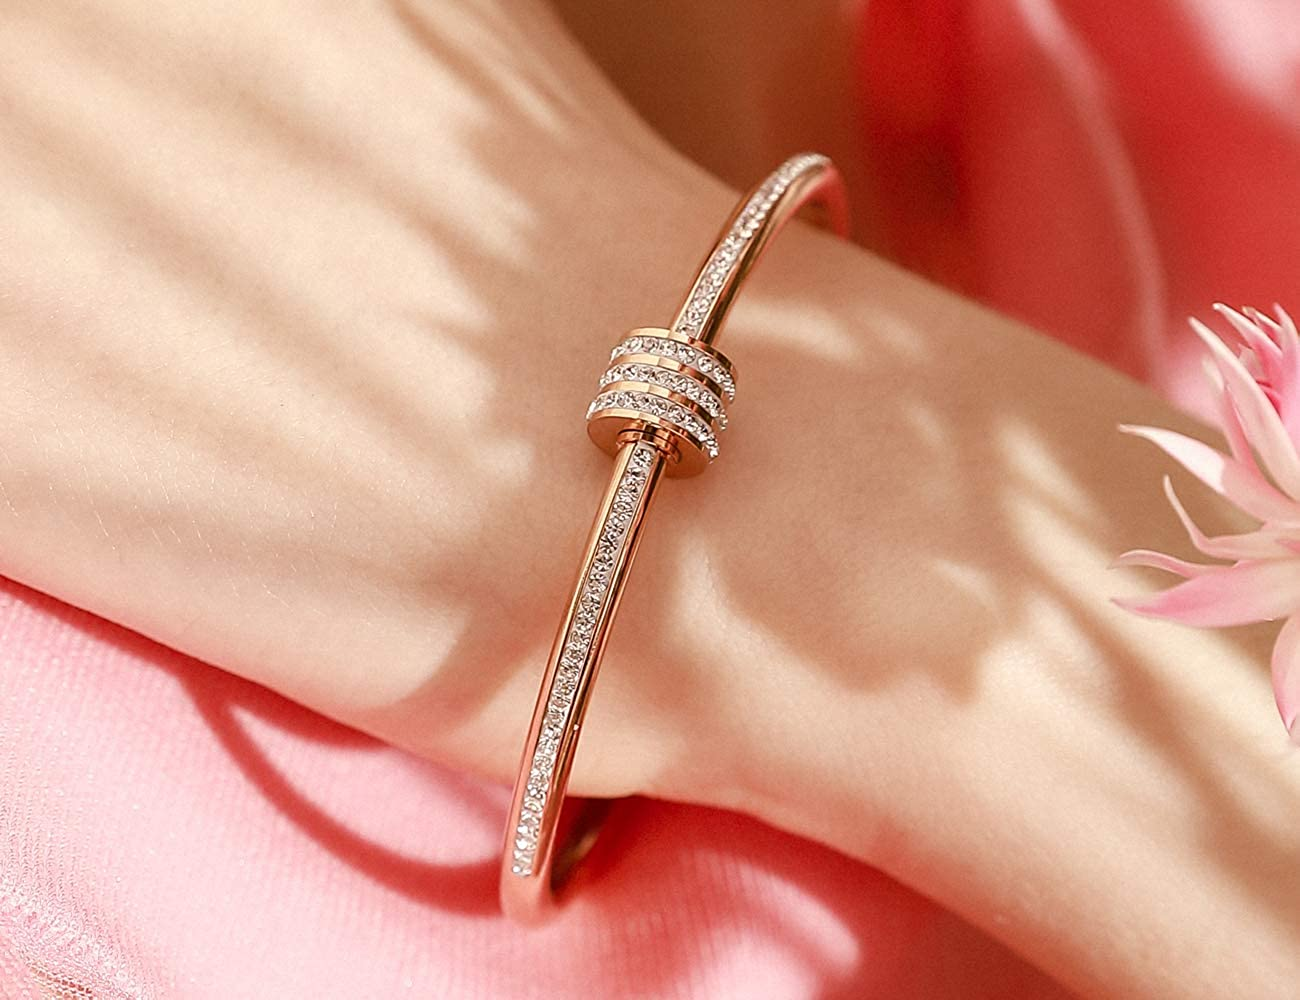 QANCI Gold Bangle Bracelet for Women Cylindrical